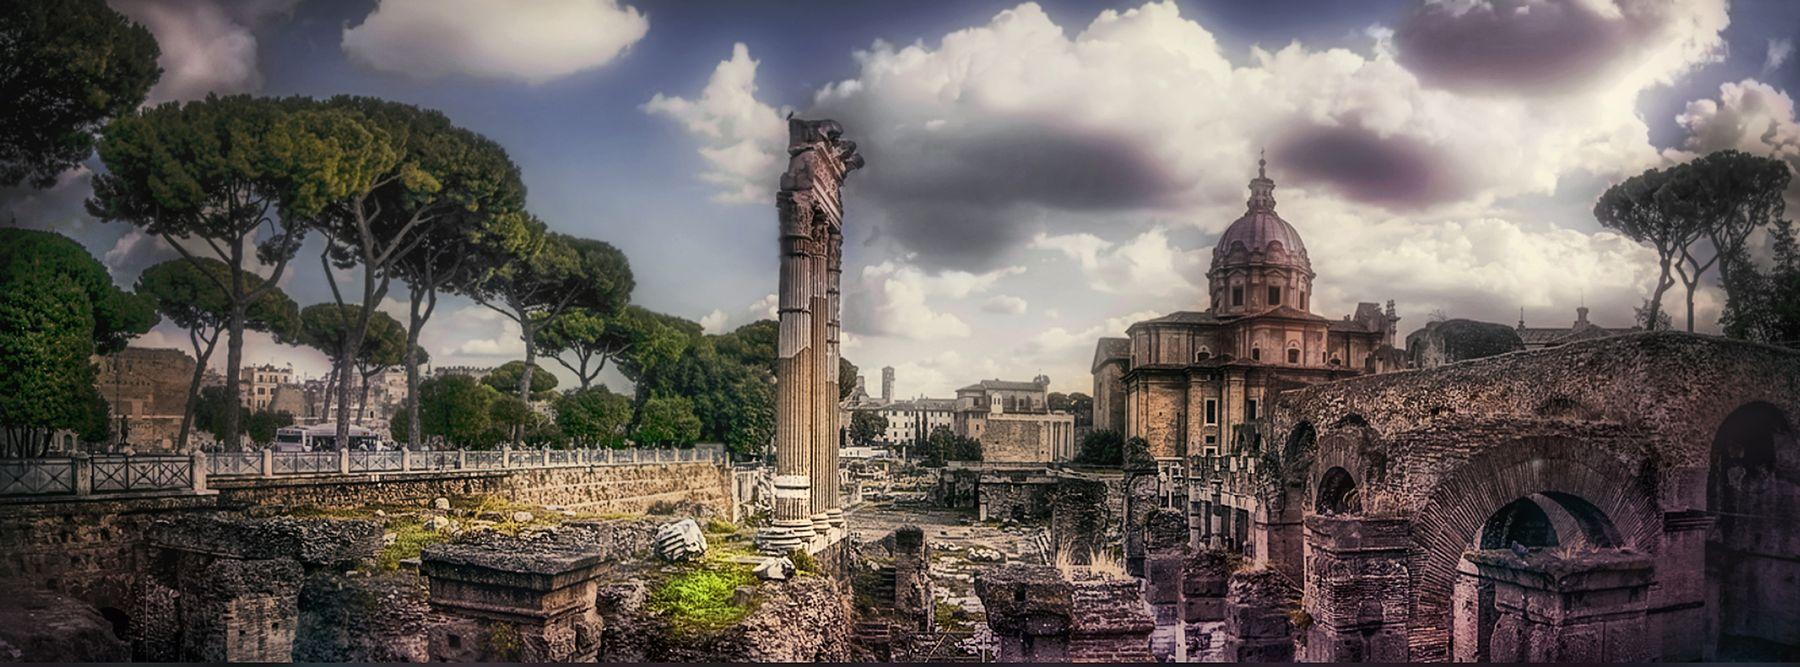 ***Старый город.Рим.